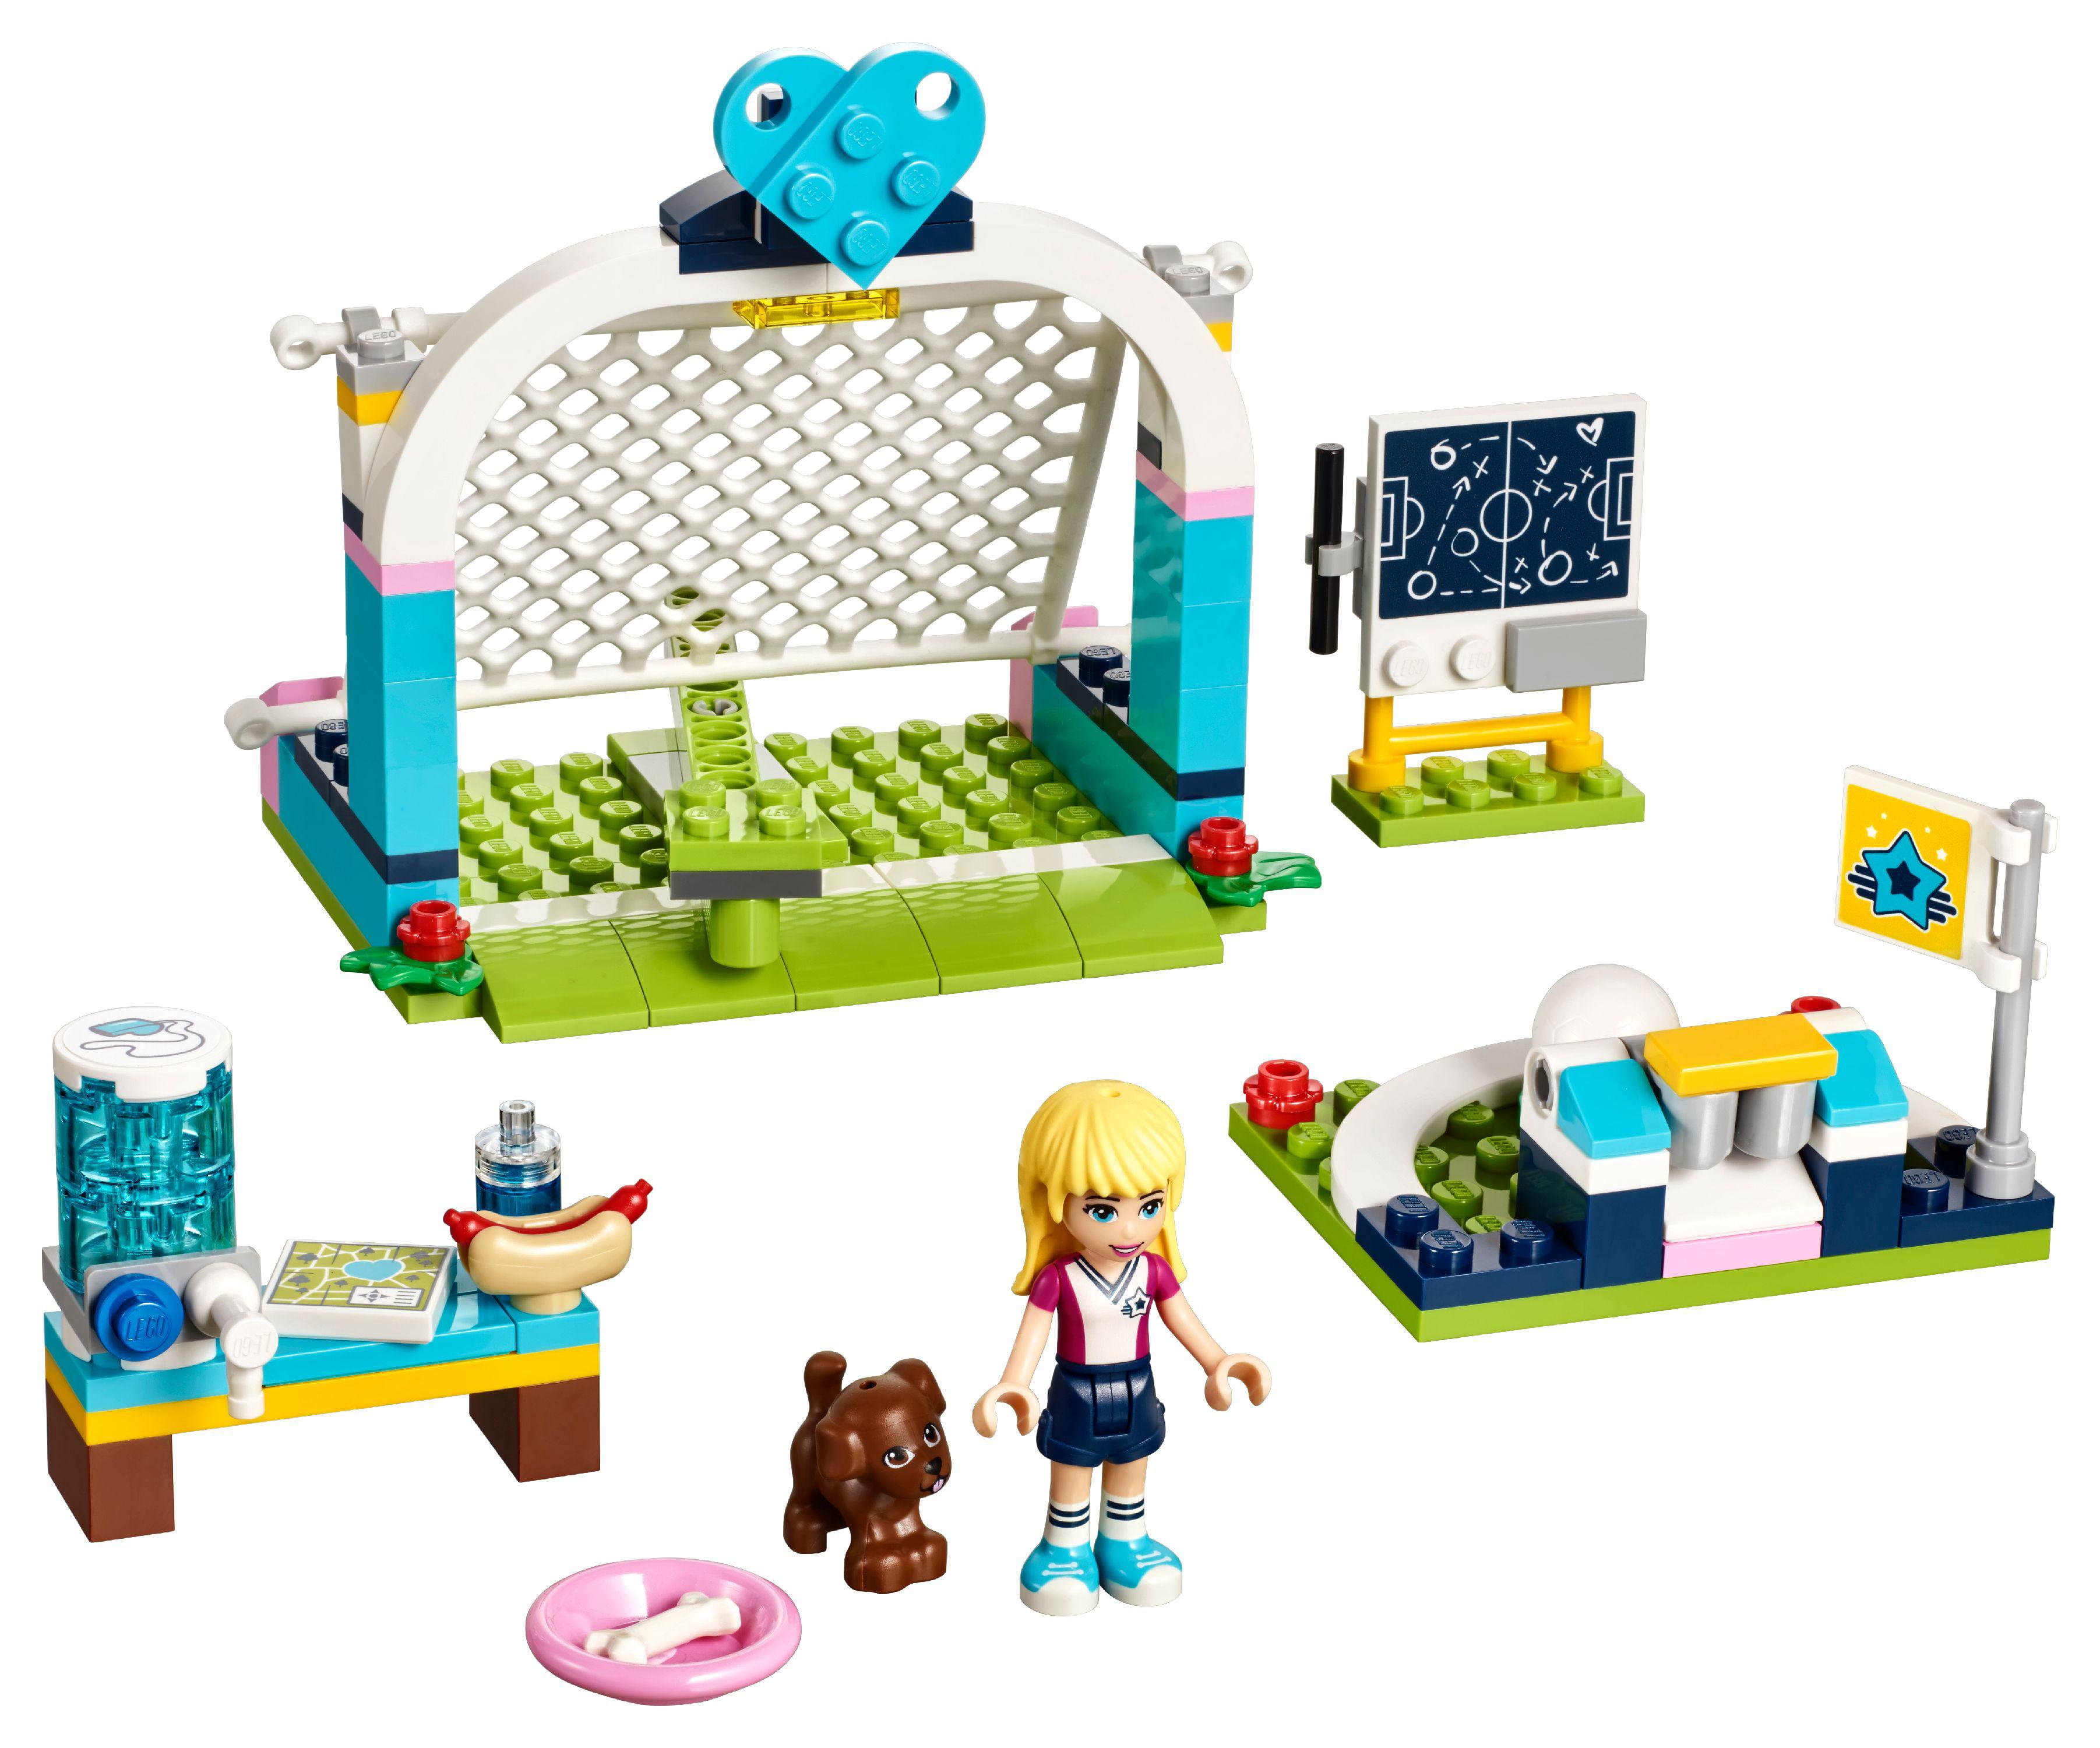 LEGO Friends Stephanie's Soccer Practice 41330 Building Set (119 Piece)